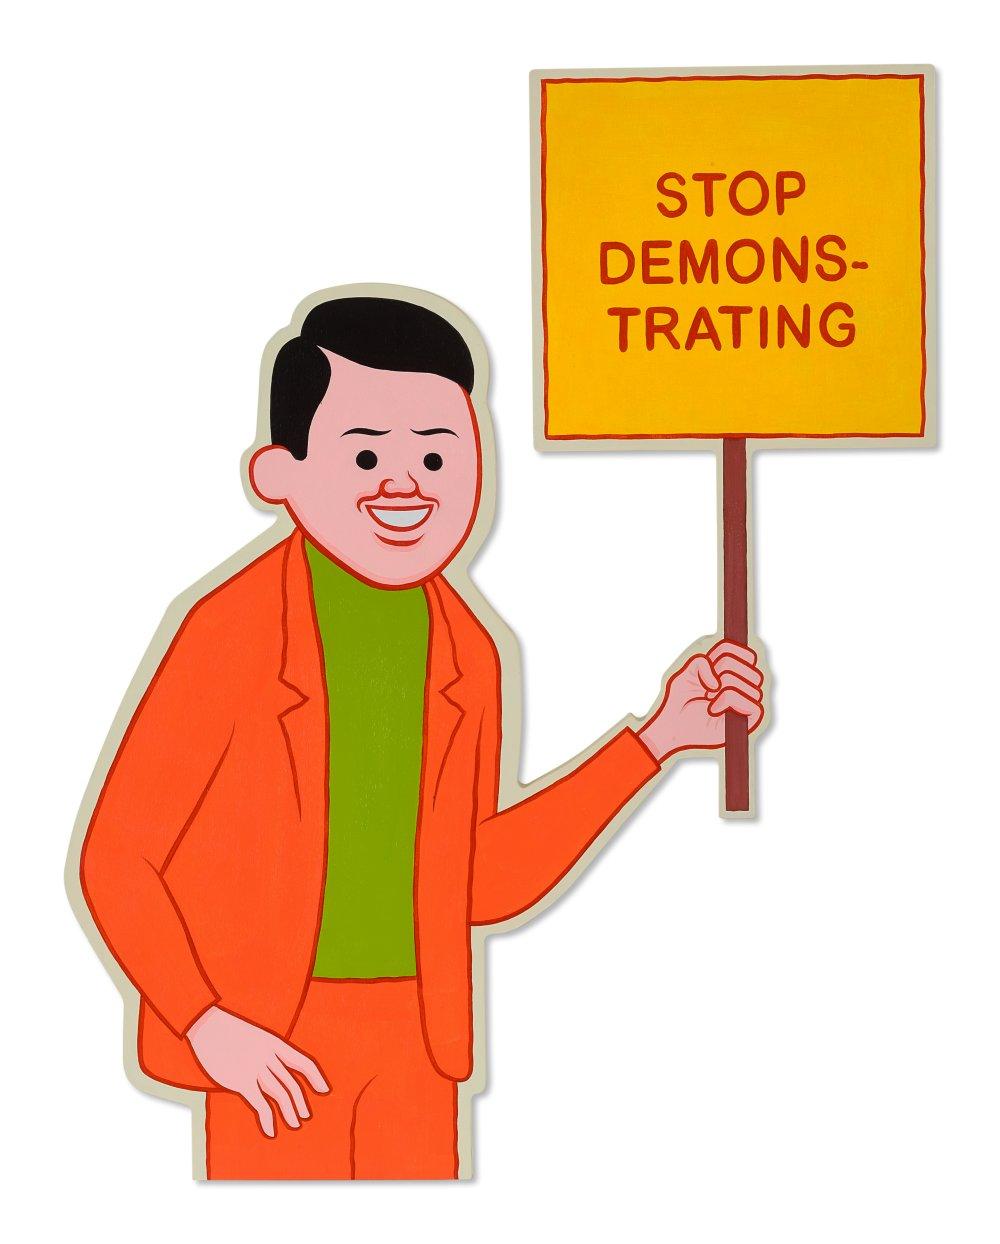 Stop demonstrating